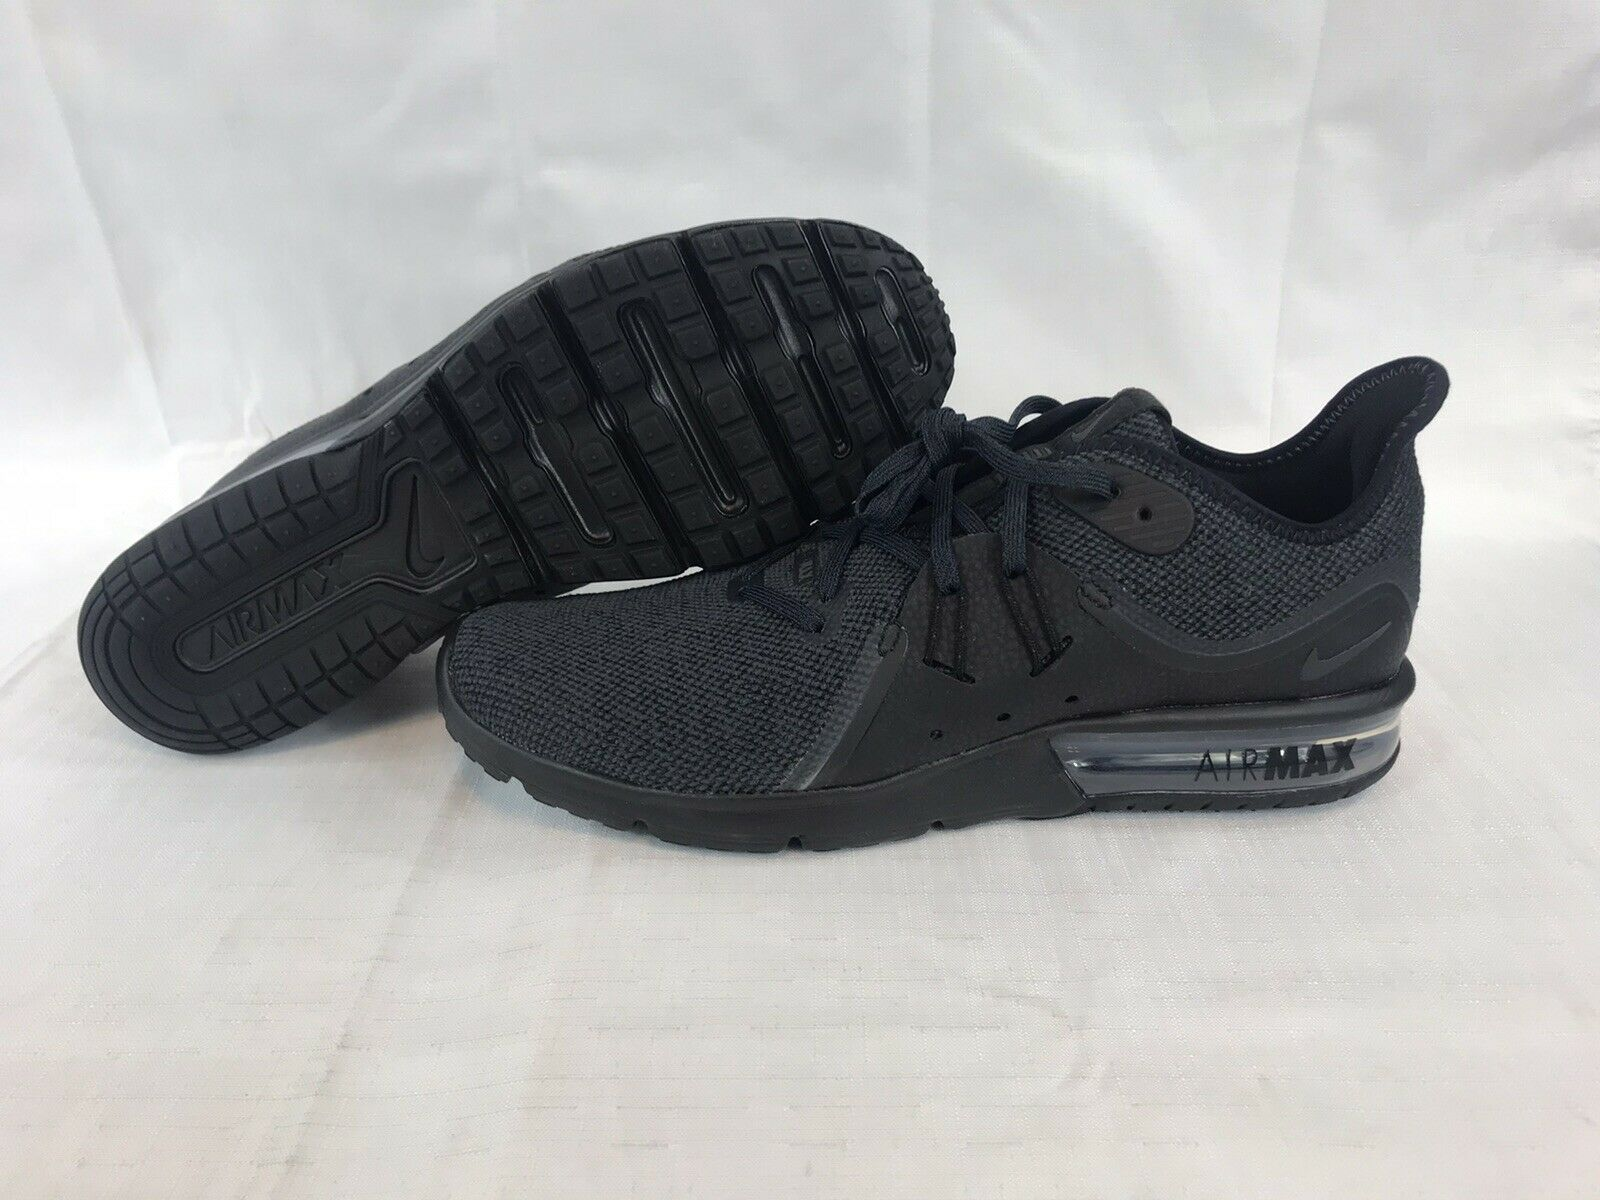 persona que practica jogging Amado caligrafía  Mens Nike Air Max Sequent 3 Running Shoes Black Gray 13 924694-010 for sale  online   eBay